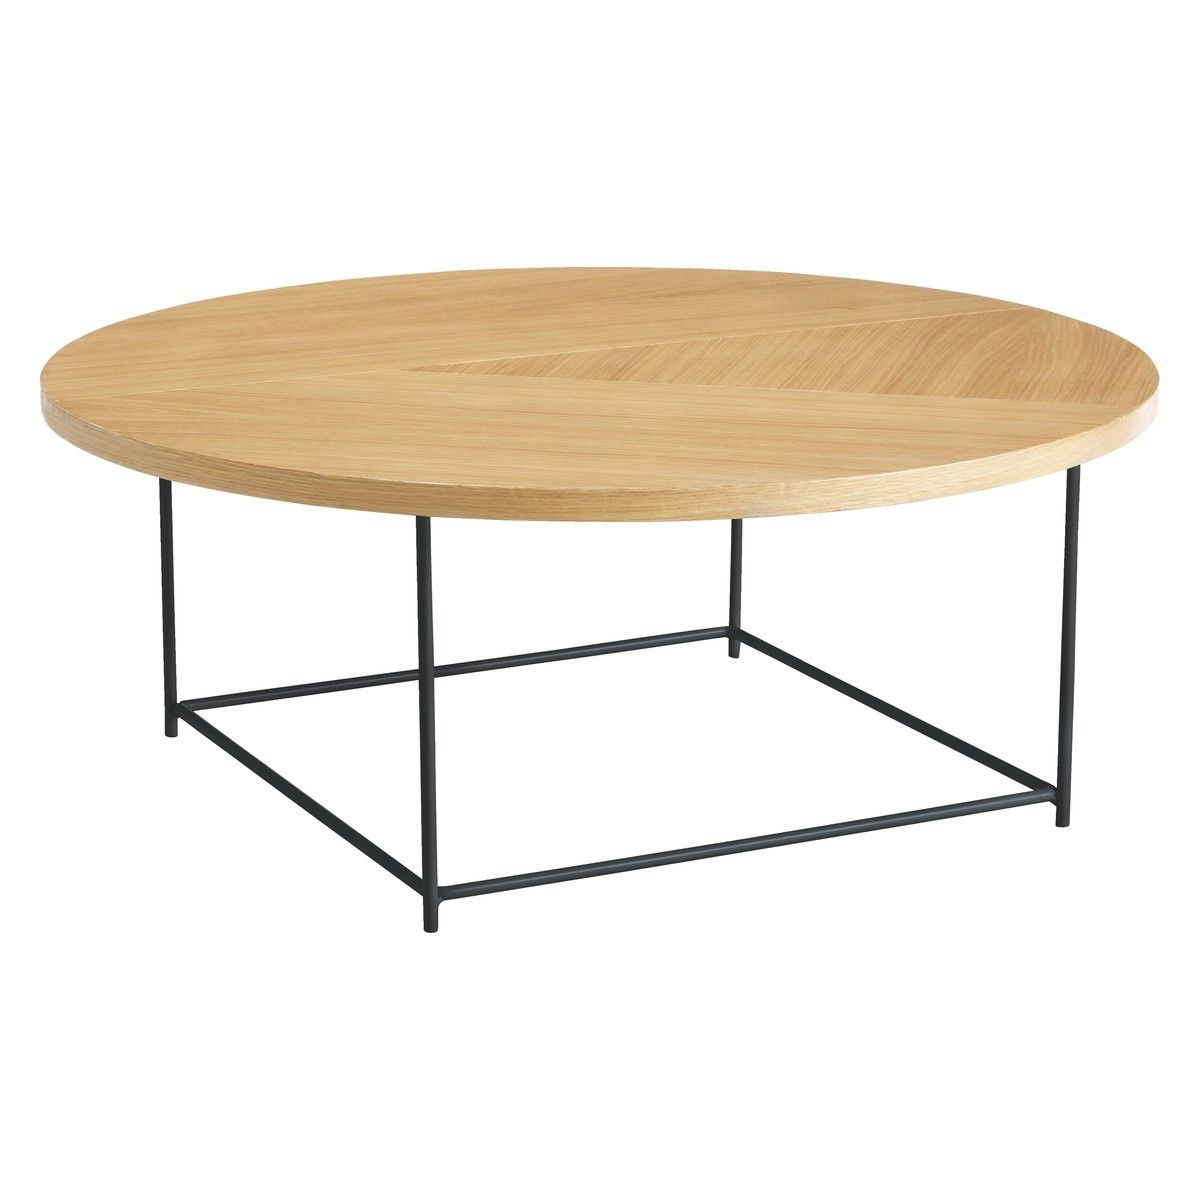 coralie oak coffee table buy now at habitat uk table ideas rh pinterest com